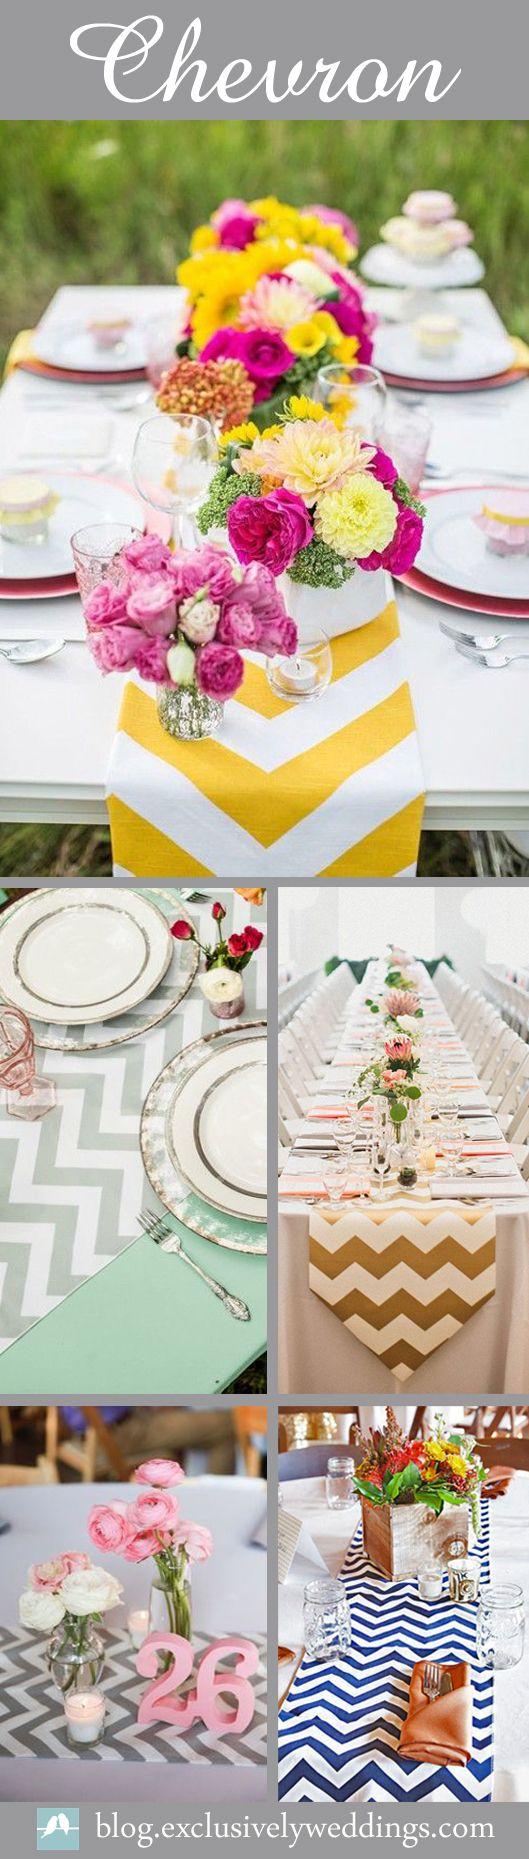 145 best exclusively weddings blog images on pinterest chevron wedding decor ideas junglespirit Images